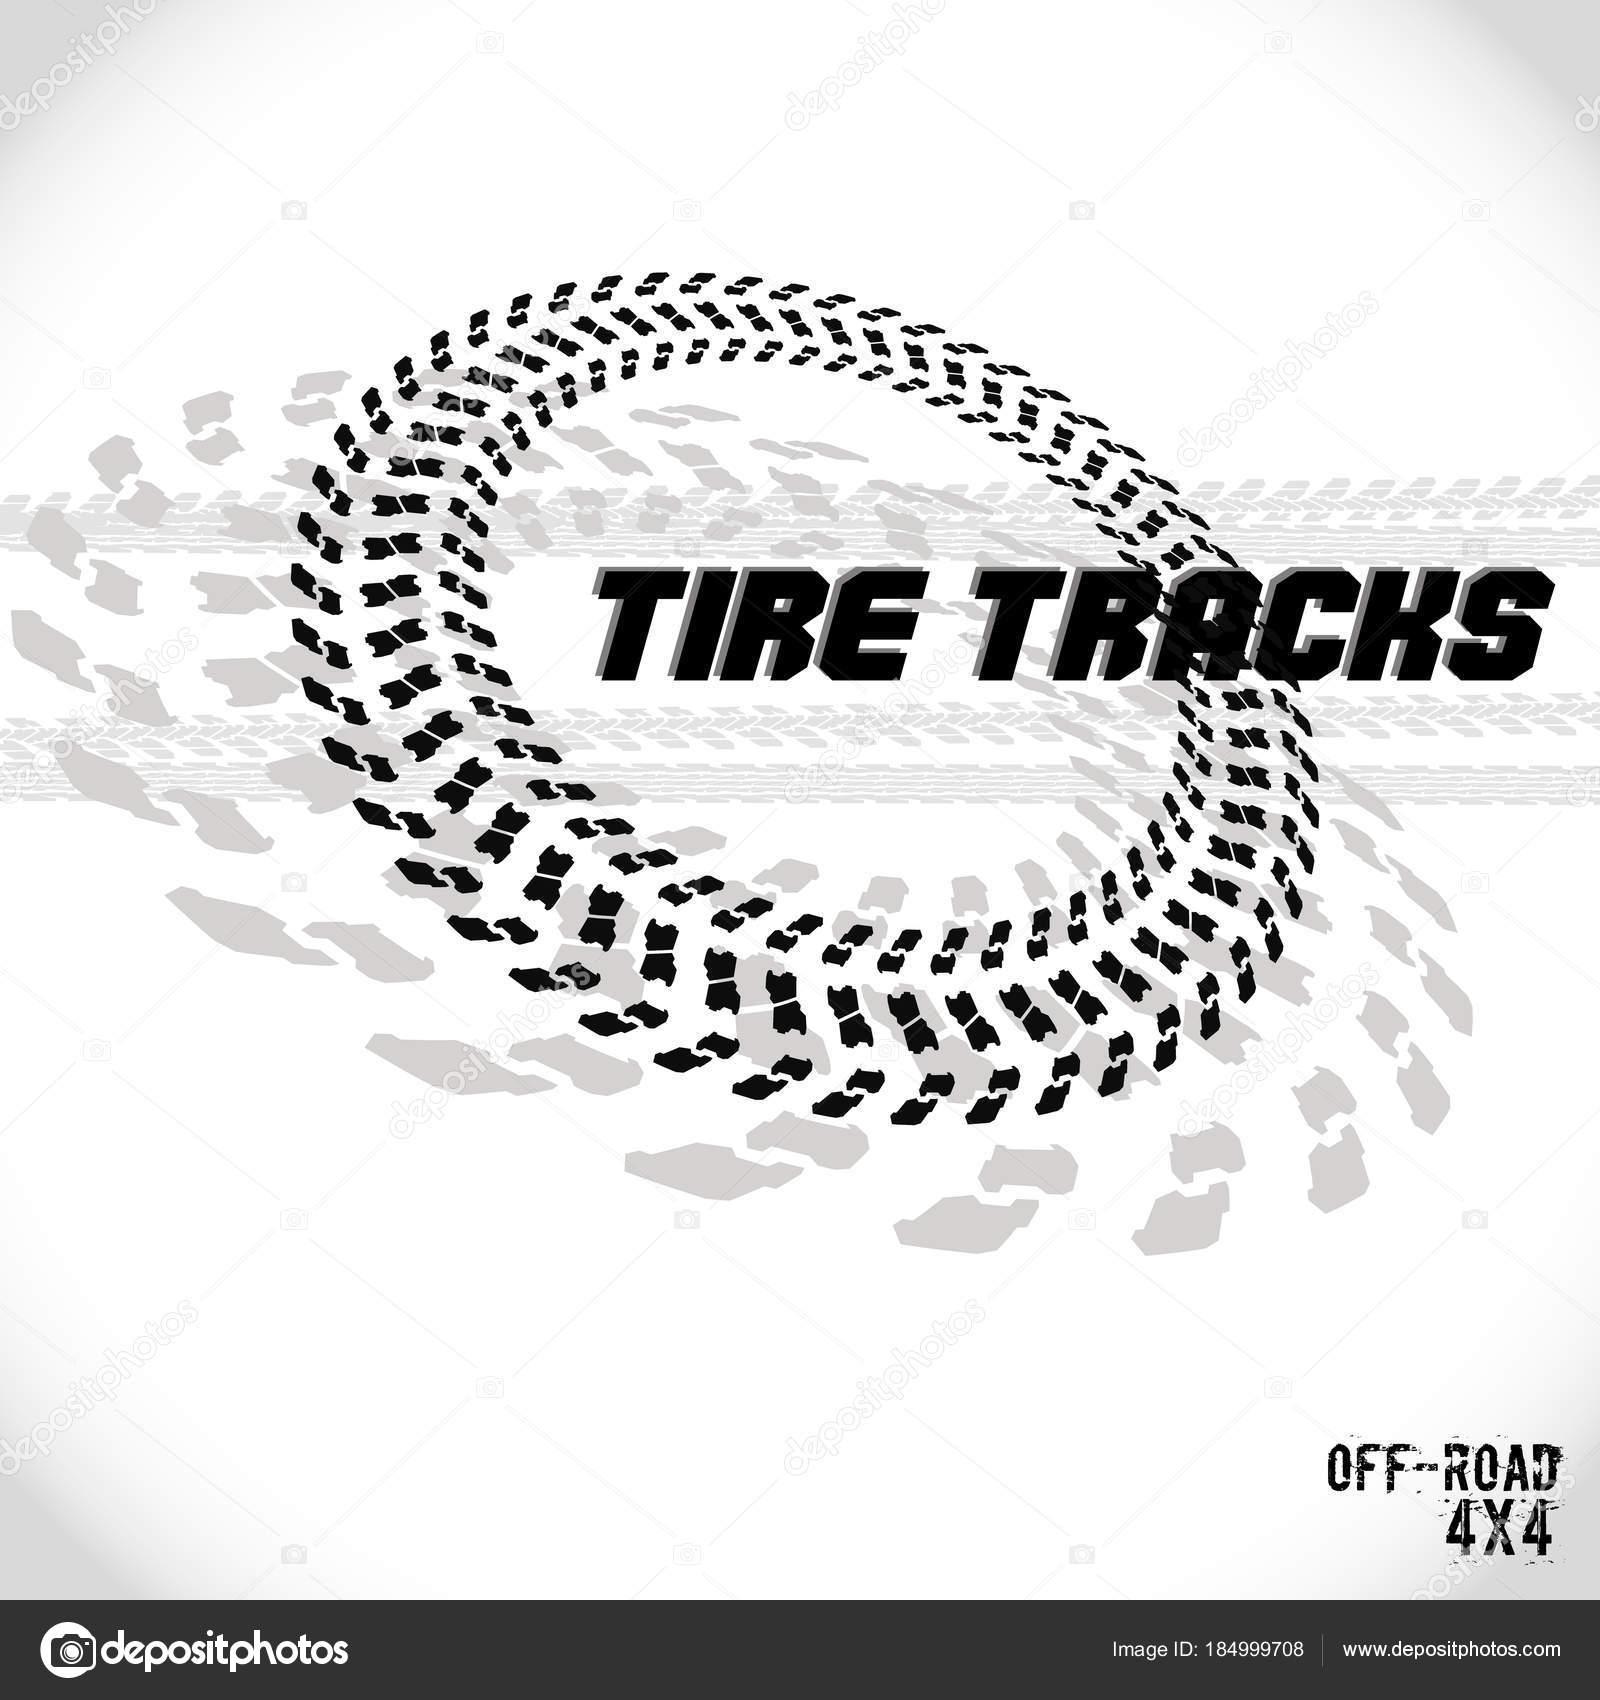 Track Logo Design Tire Track Silhouette Print Logo Design Vector Illustration Eps10 Stock Vector C Ivvivvi 184999708